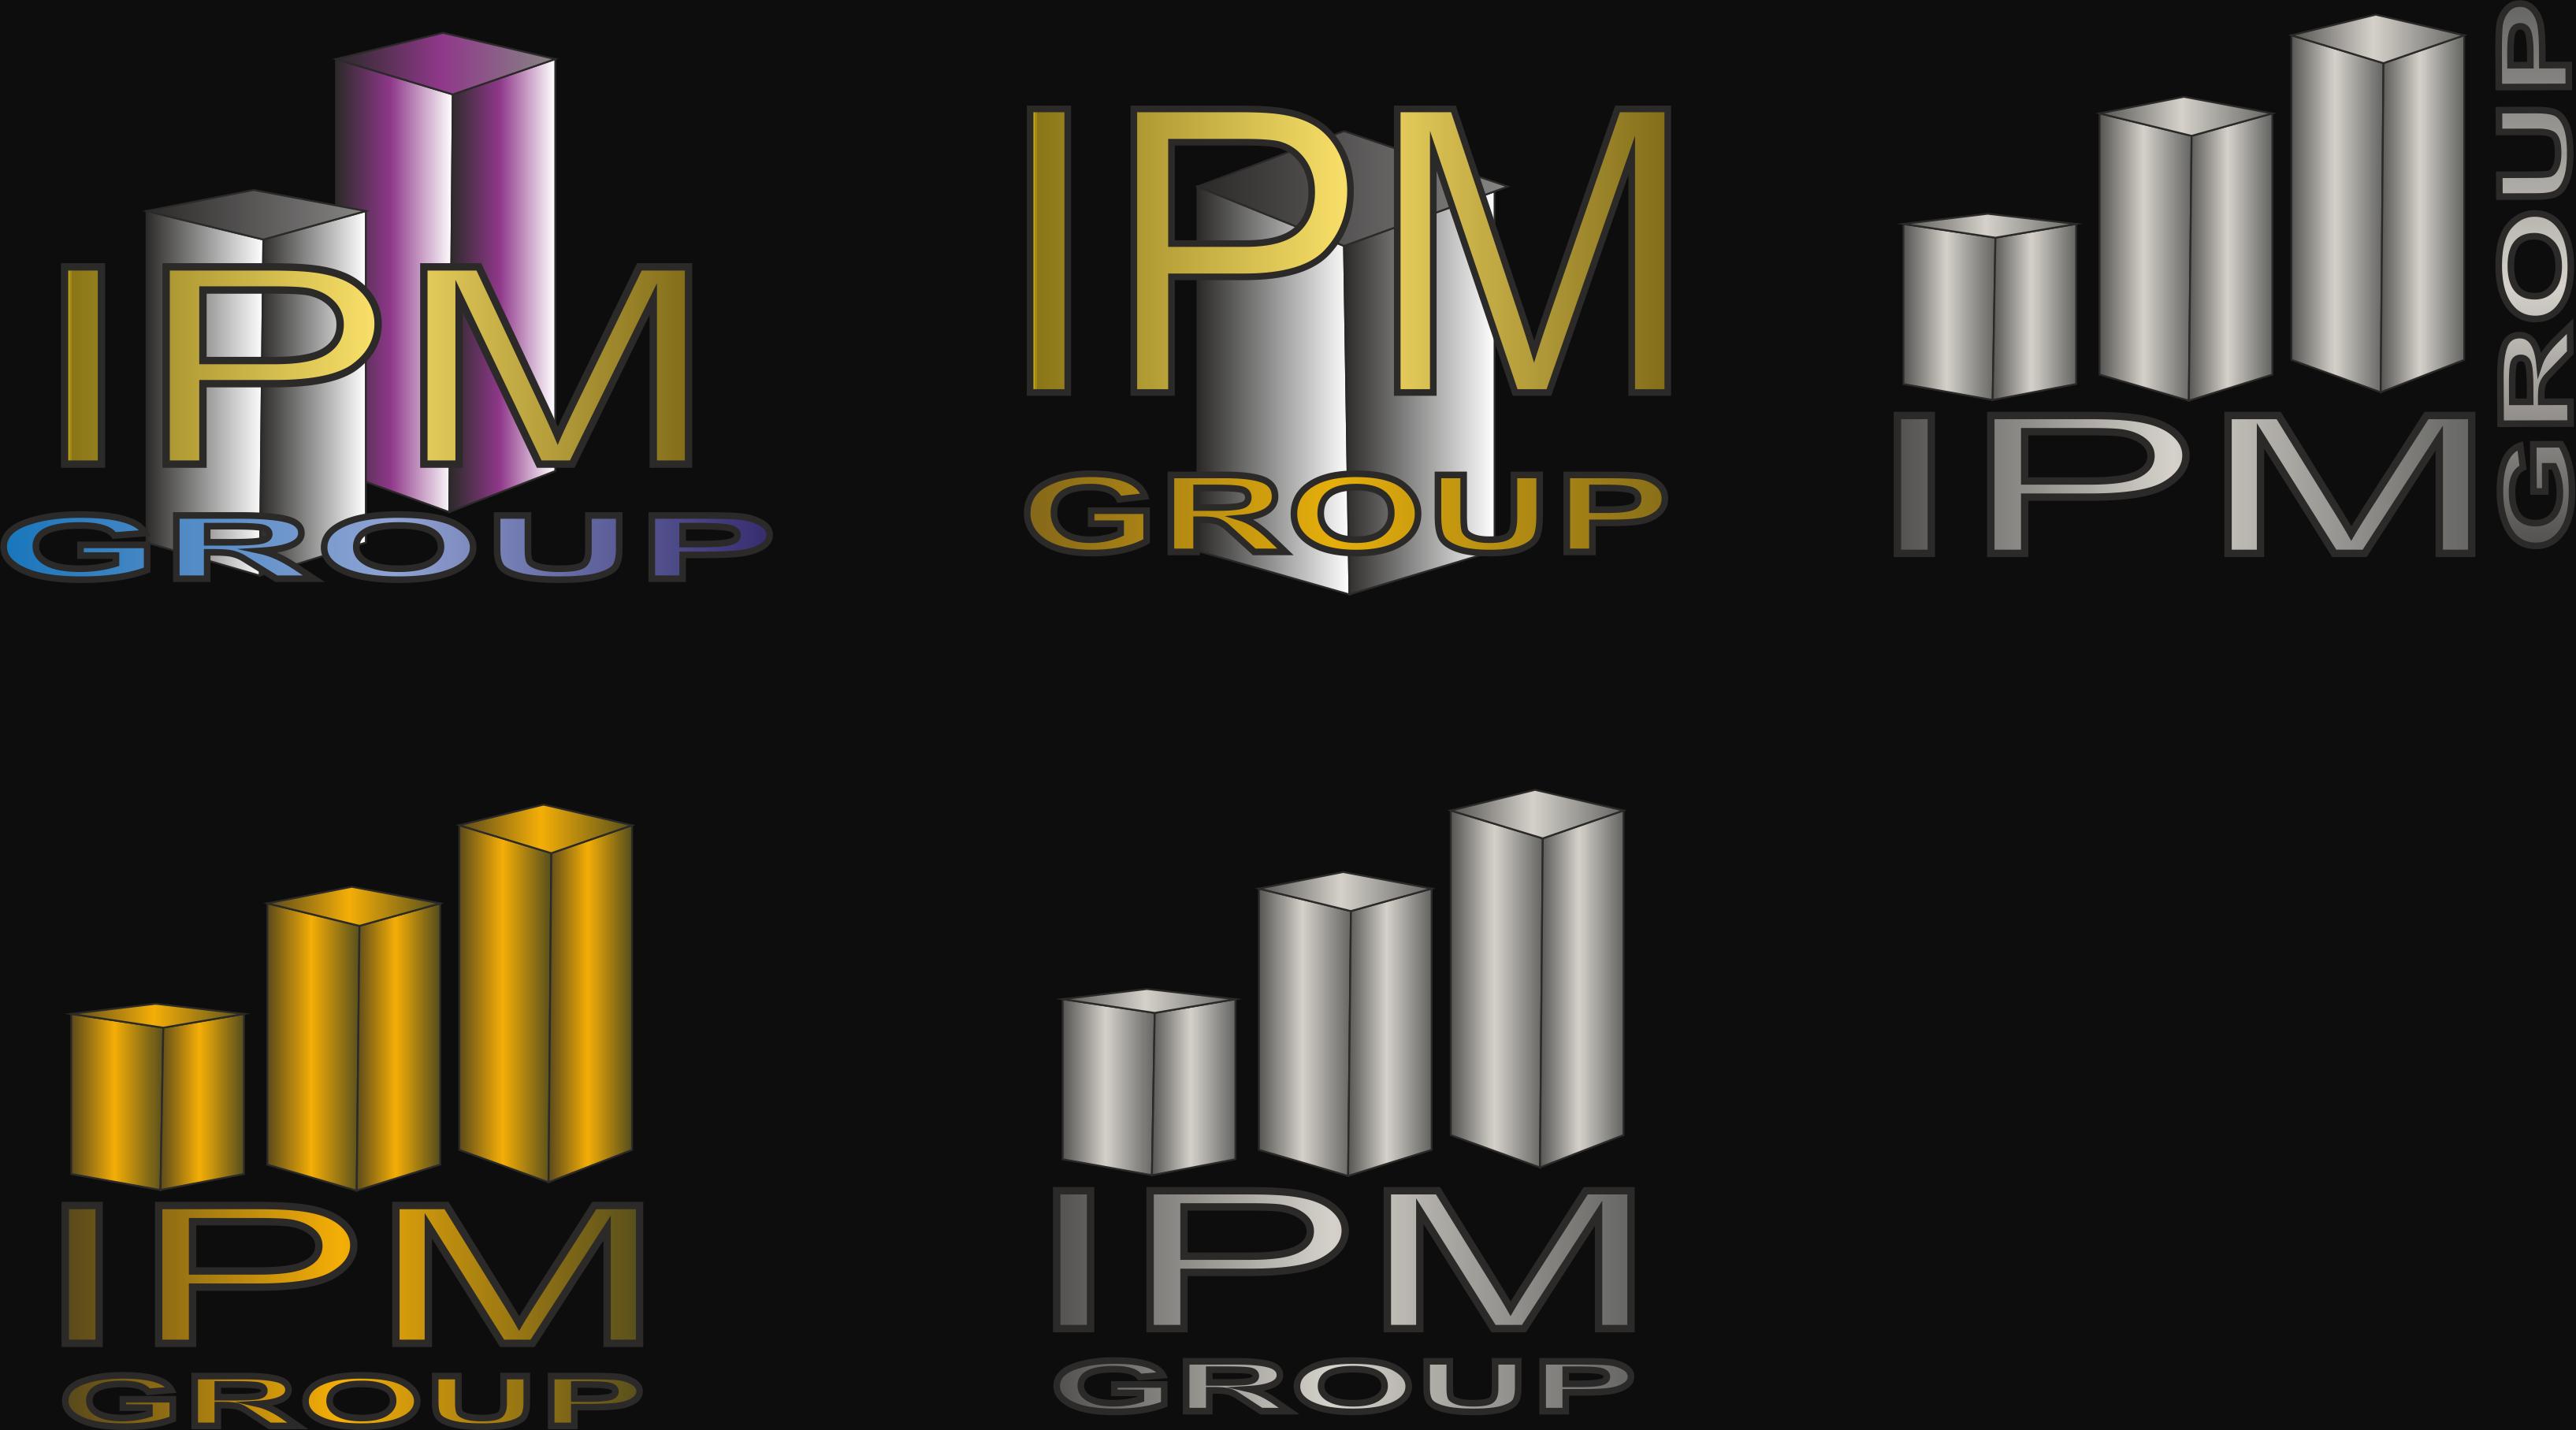 Разработка логотипа для управляющей компании фото f_7225f85ece960b80.png